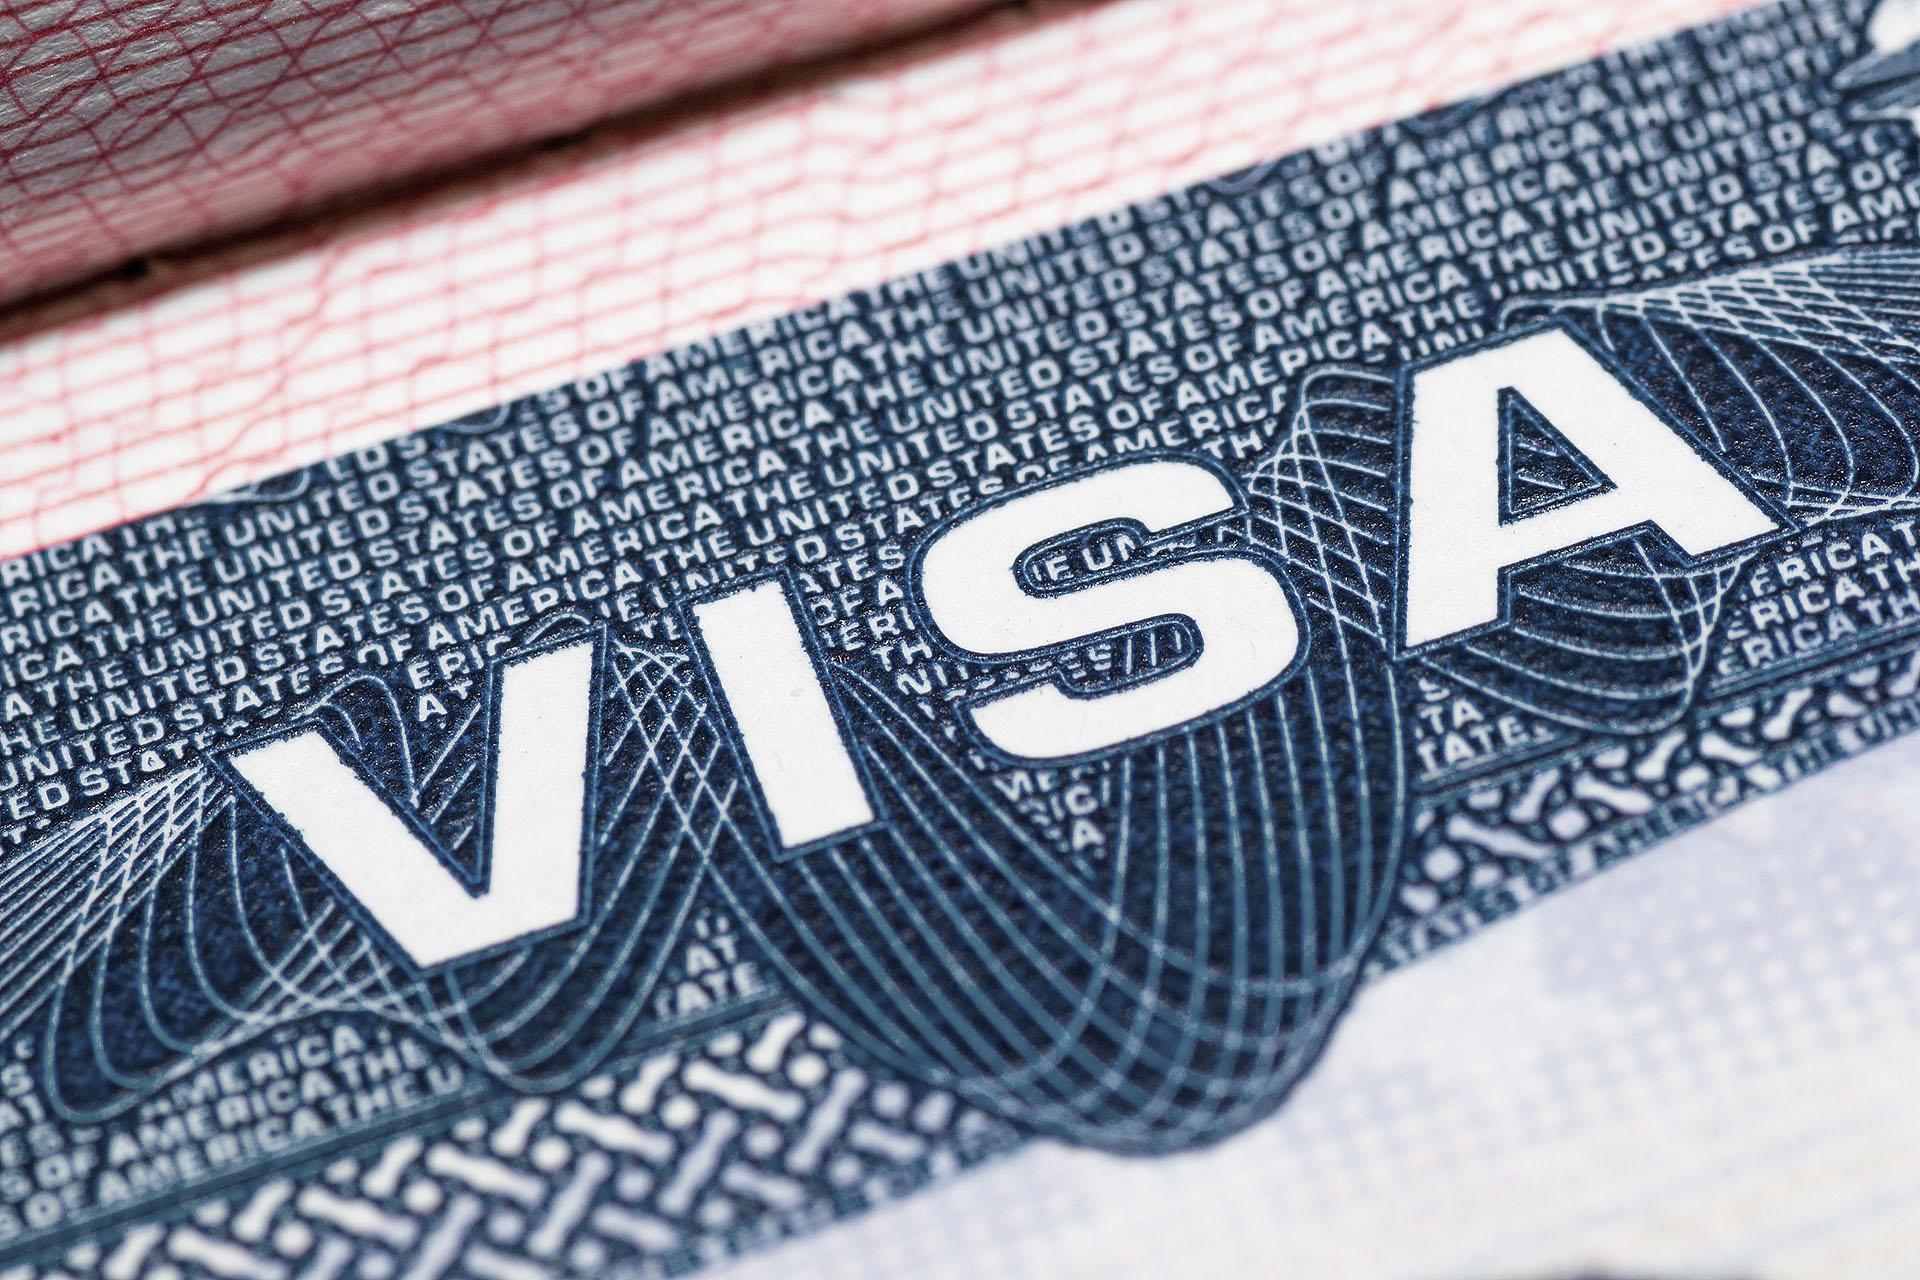 Primalaw_Visa